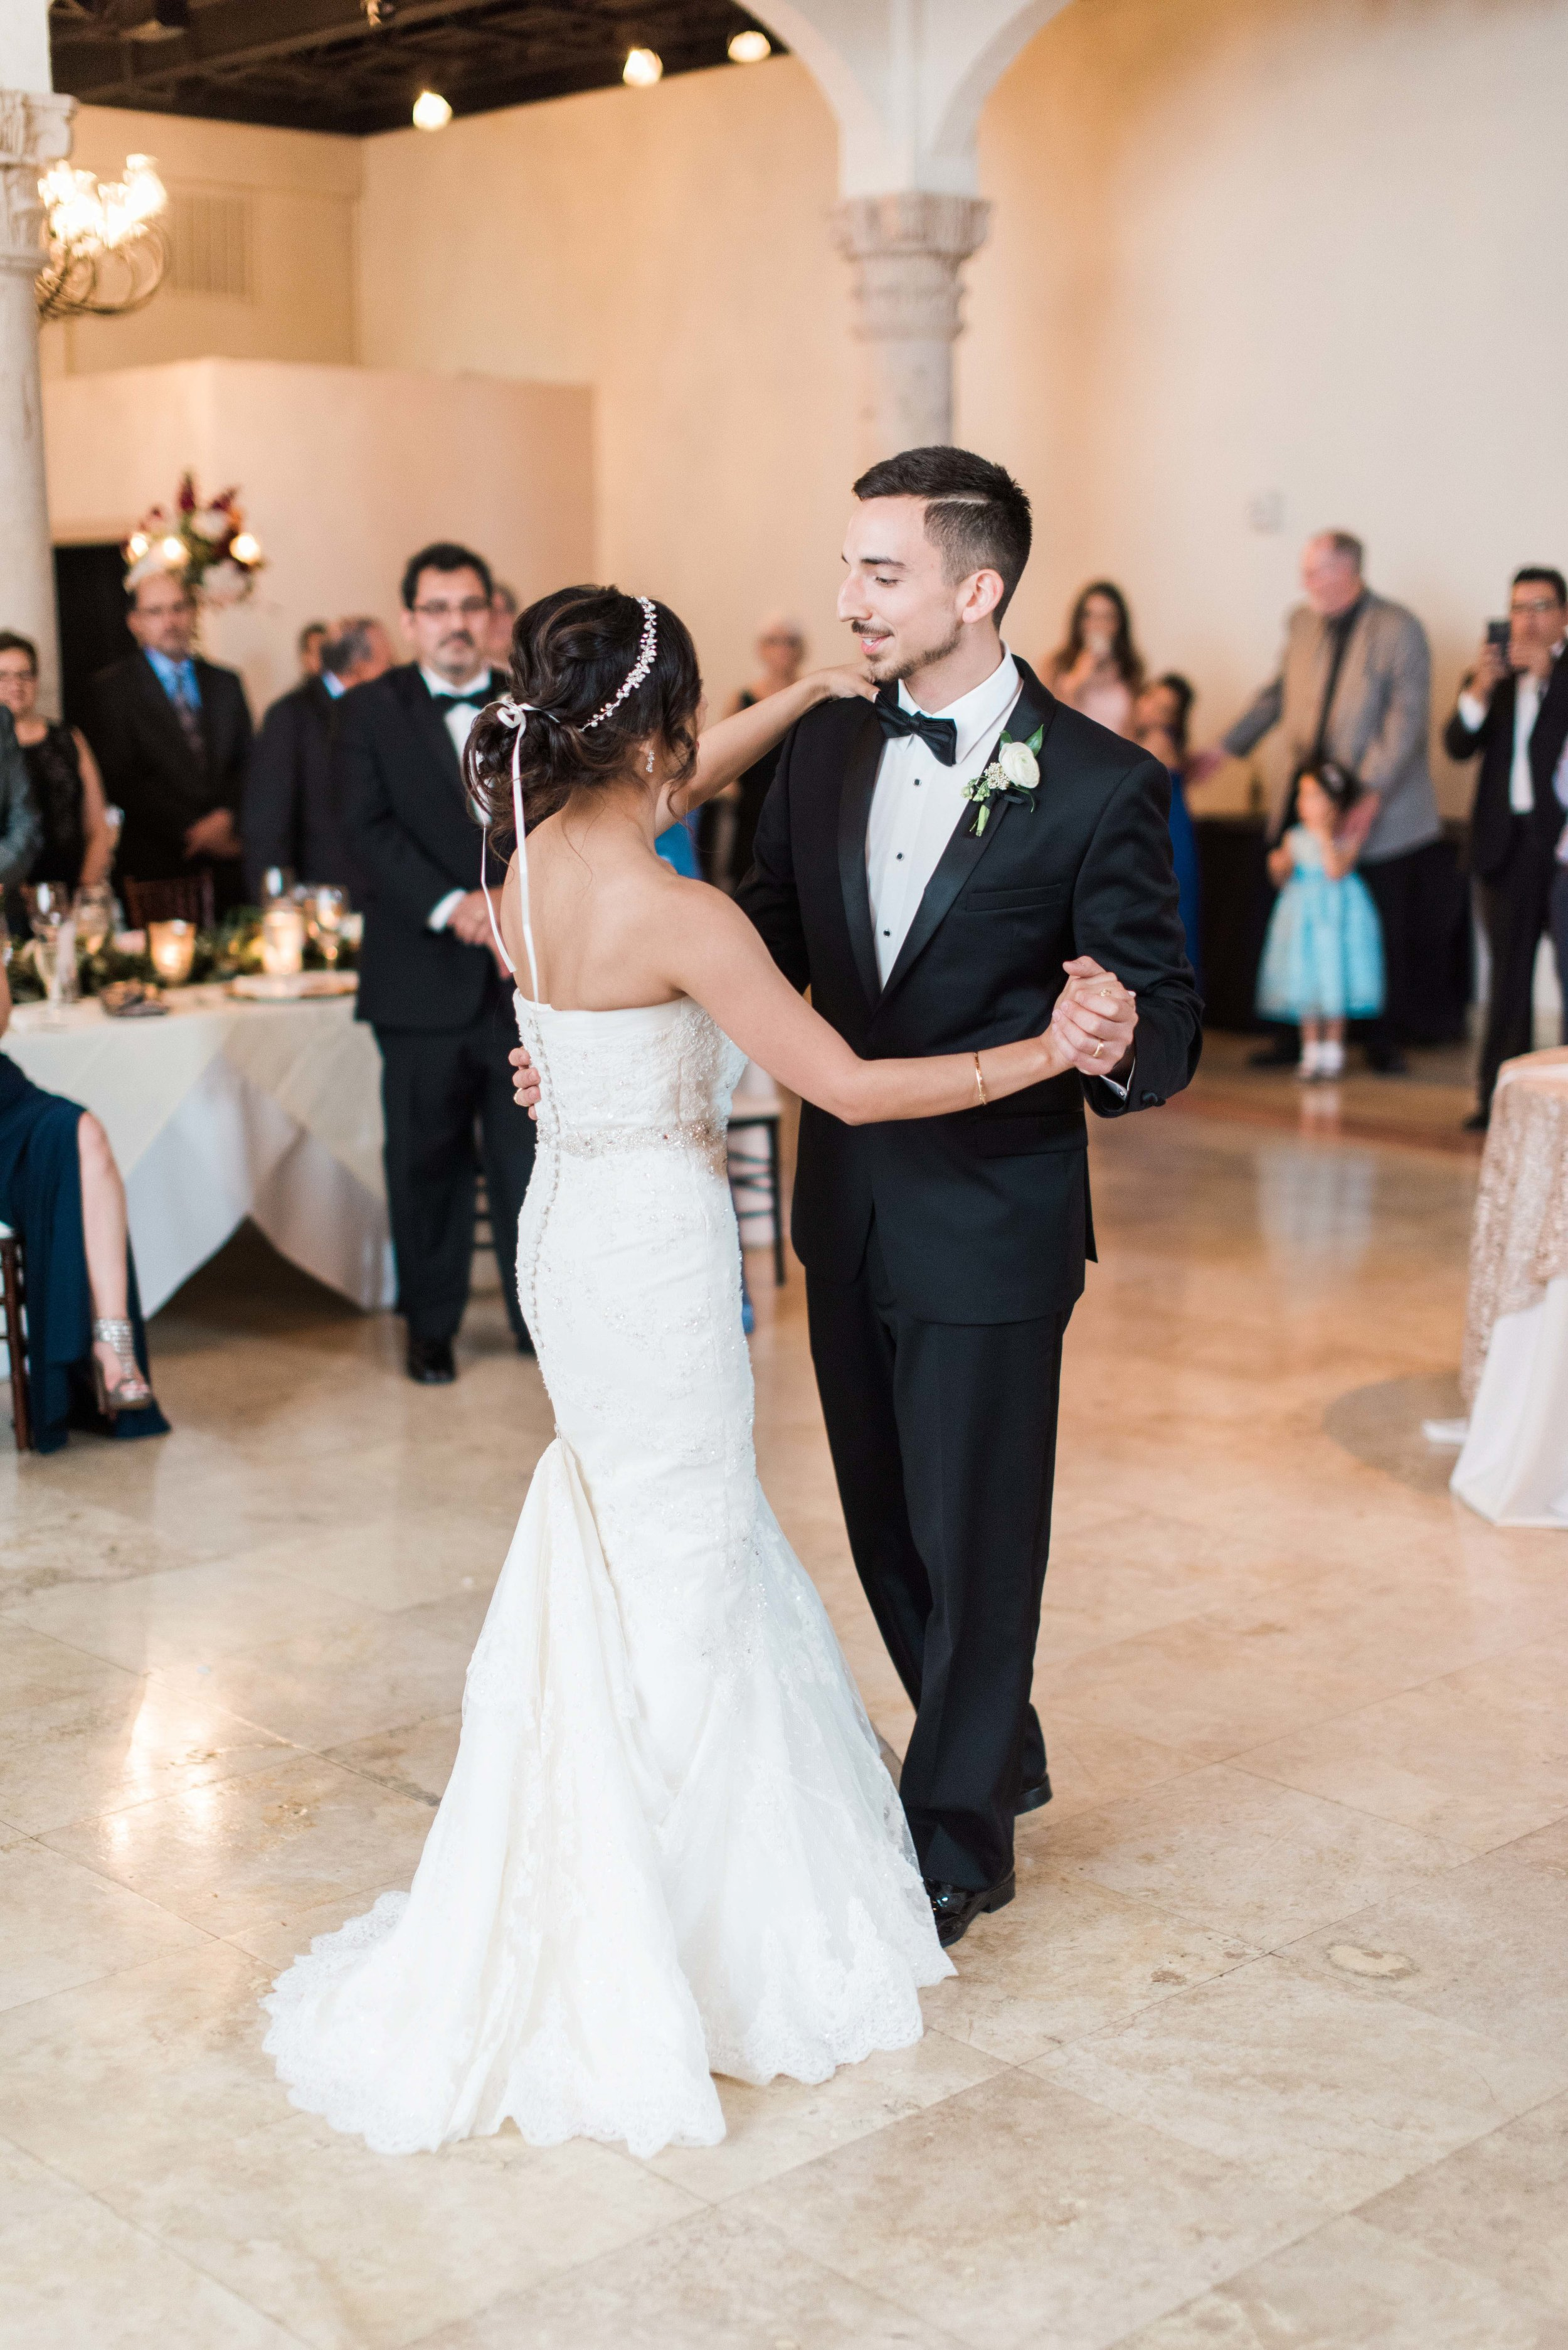 Houston-Wedding-Photography-St.-Anne-Catholic-Church-Houston-Wedding-The-Bell-Tower-on-34th-reception-wedding-film-34.jpg